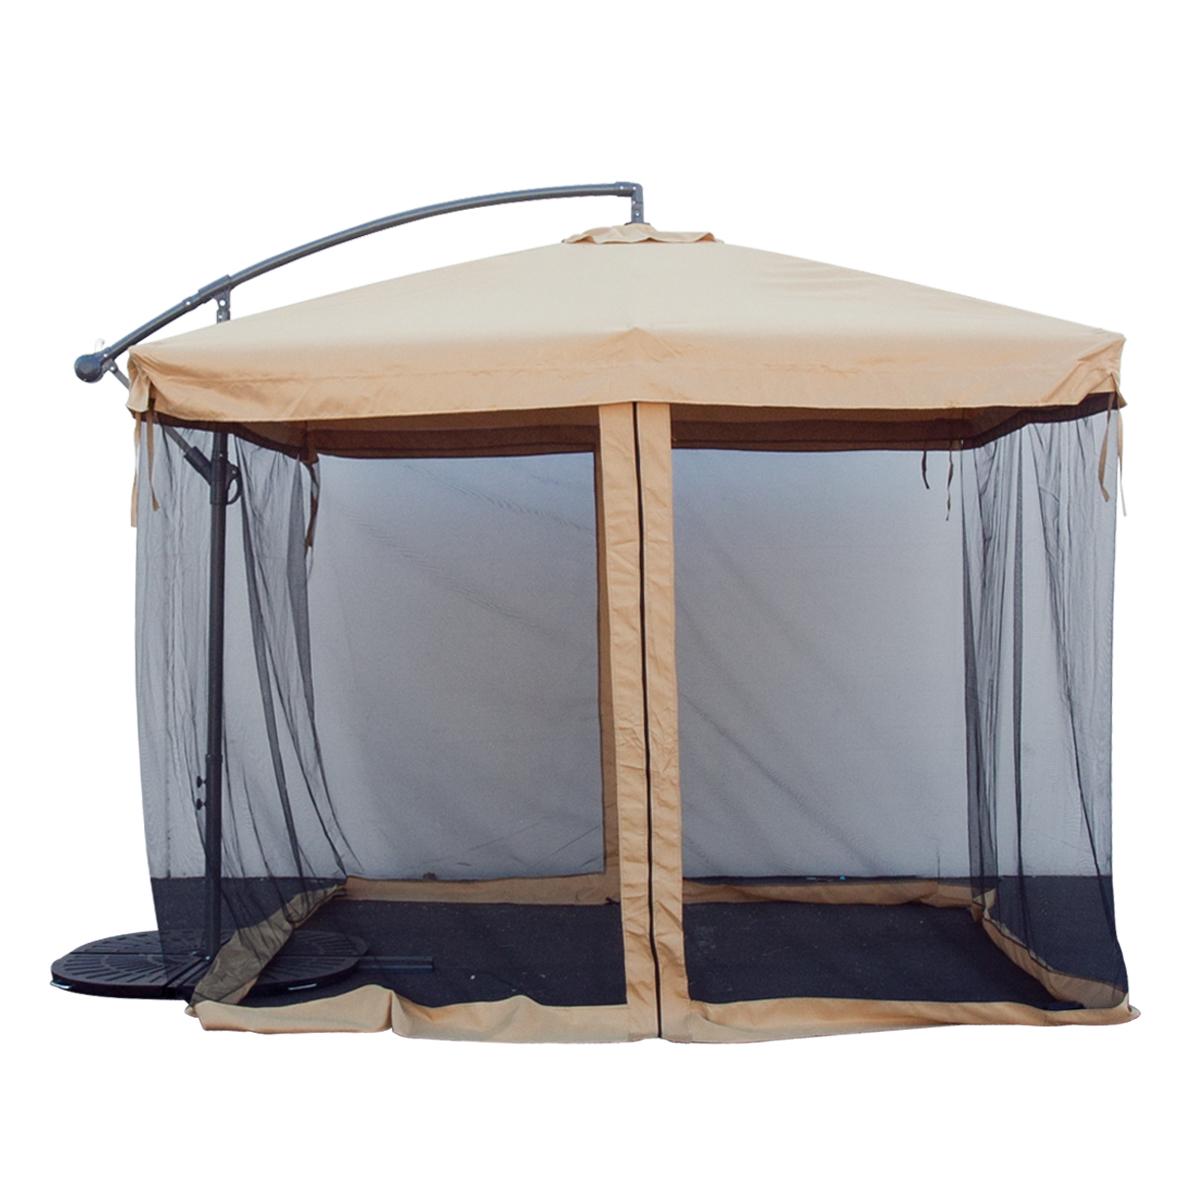 9FT Offset Tan w/ Mesh Patio Umbrella Tilt Post Deck